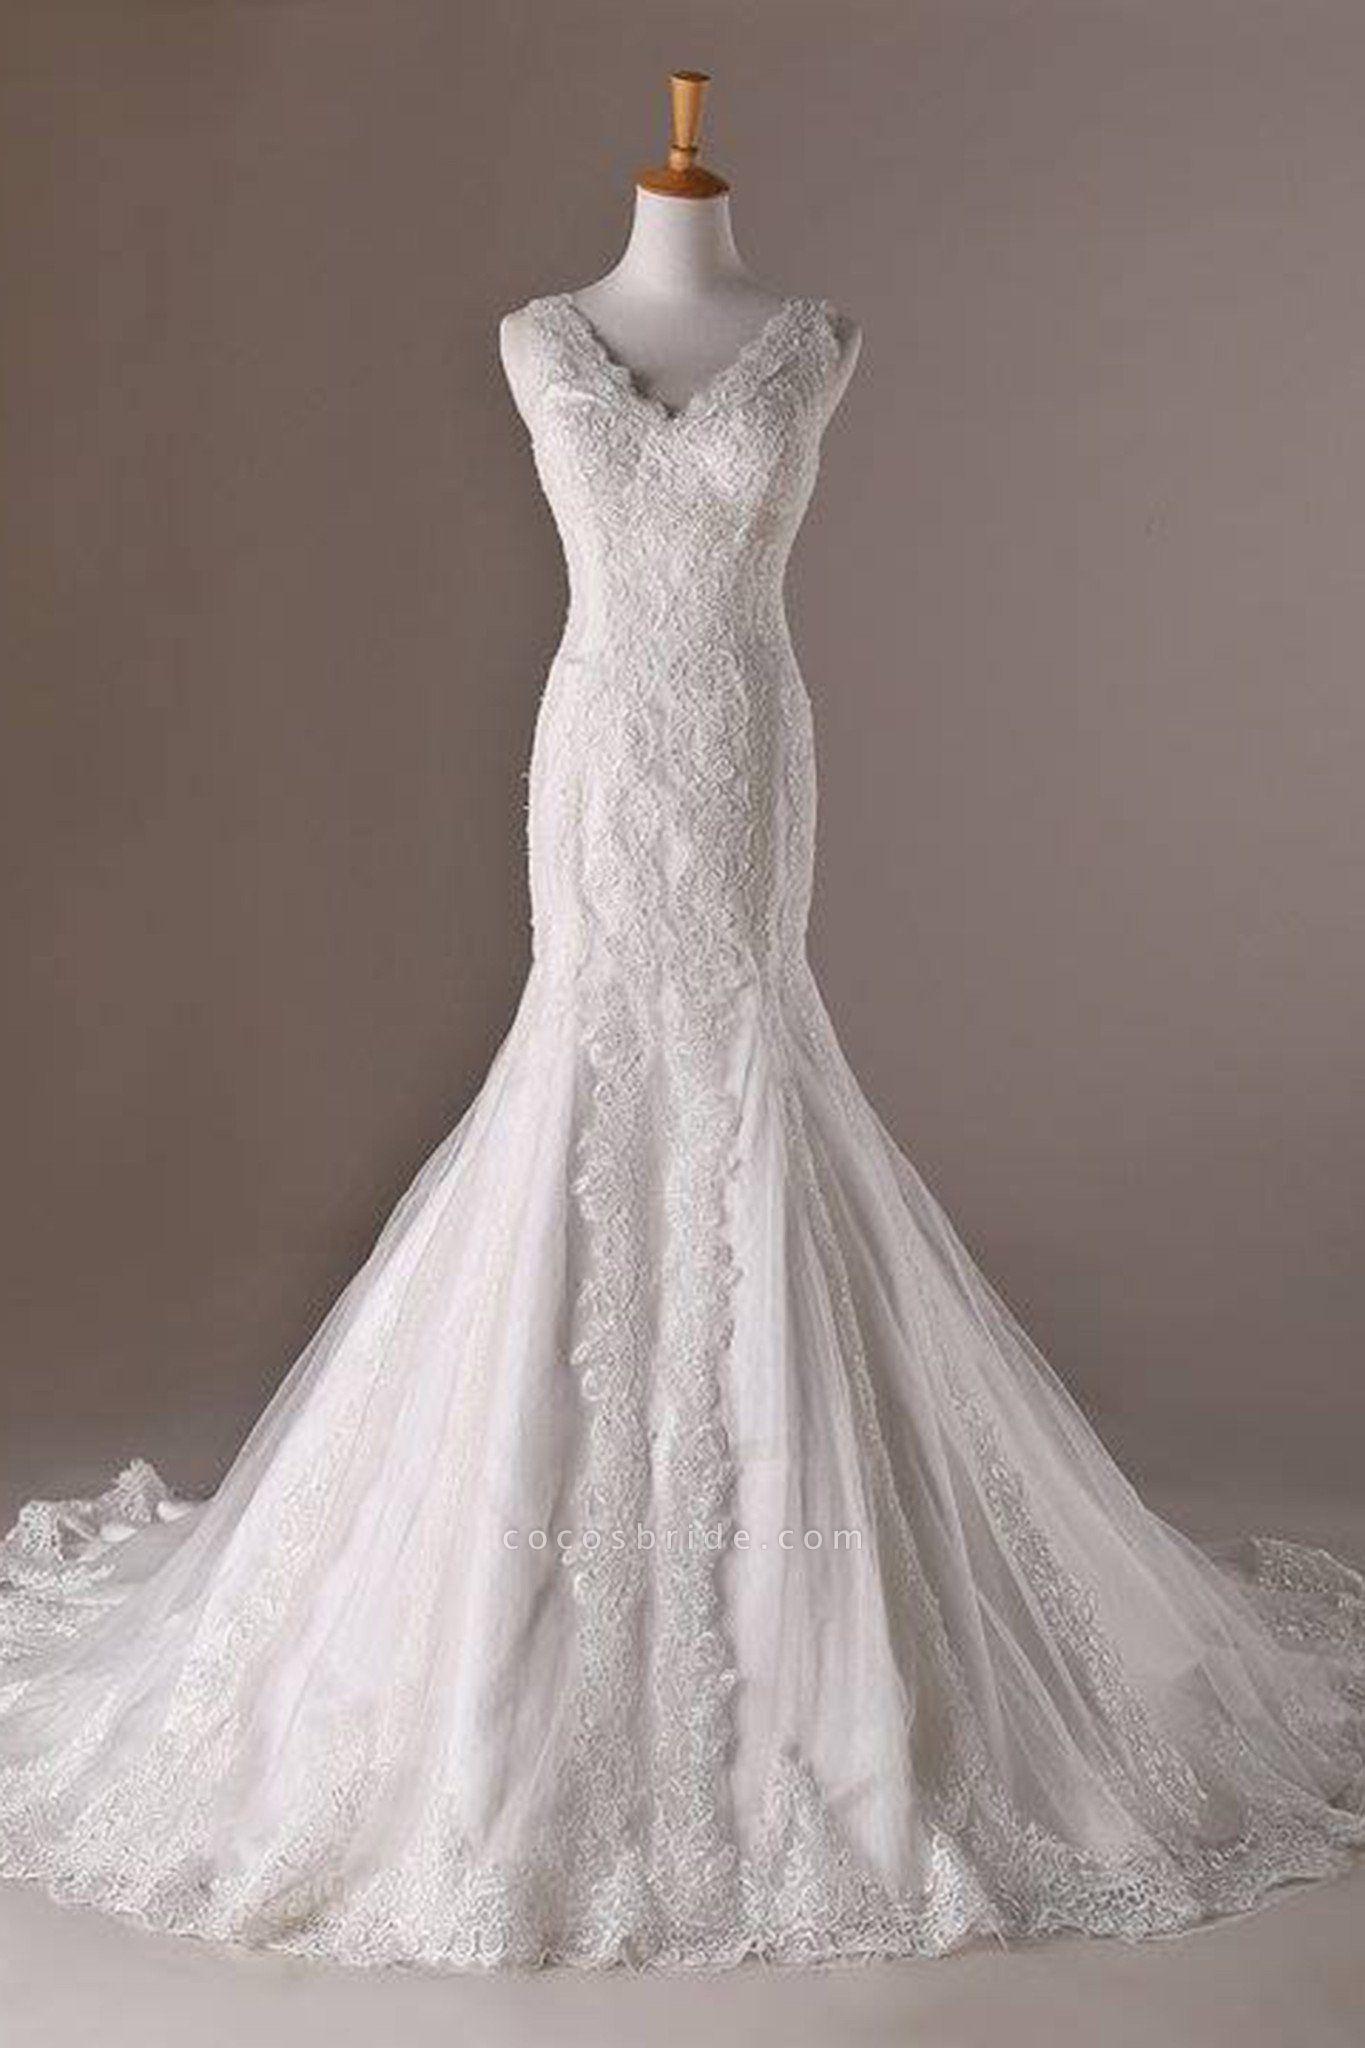 White Lace Tulle V-Neck Mermaid Train Long Wedding Dresses